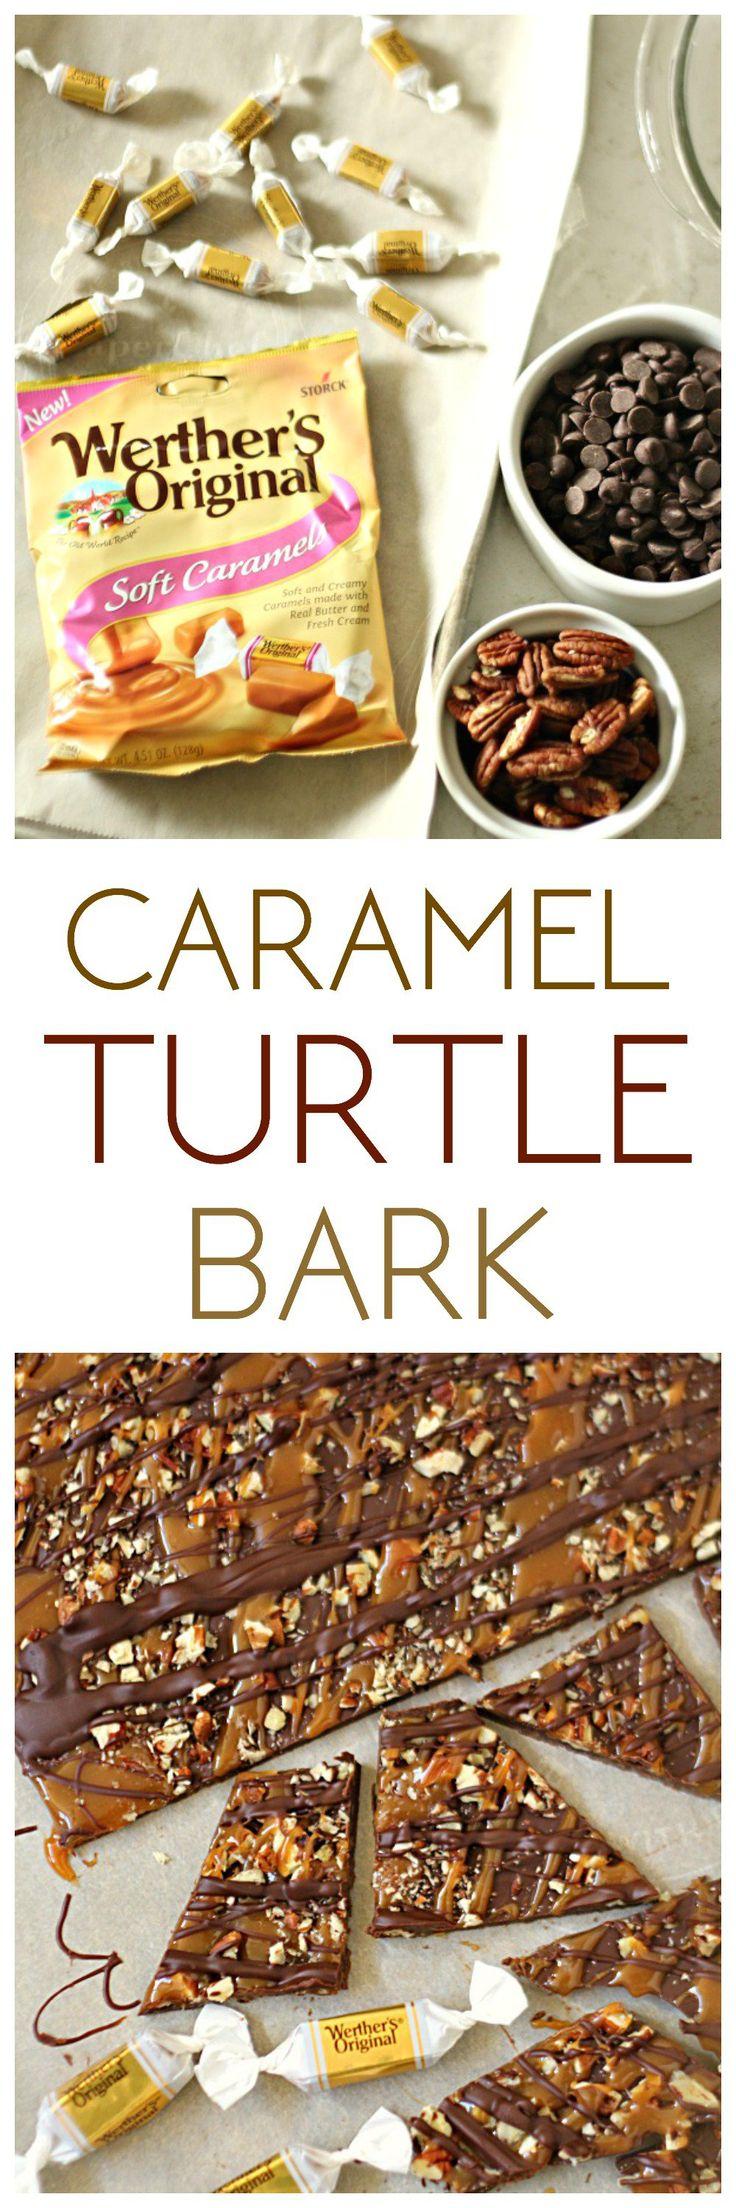 Gooey Caramel Turtle Bark from SixSistersStuff.com #ad